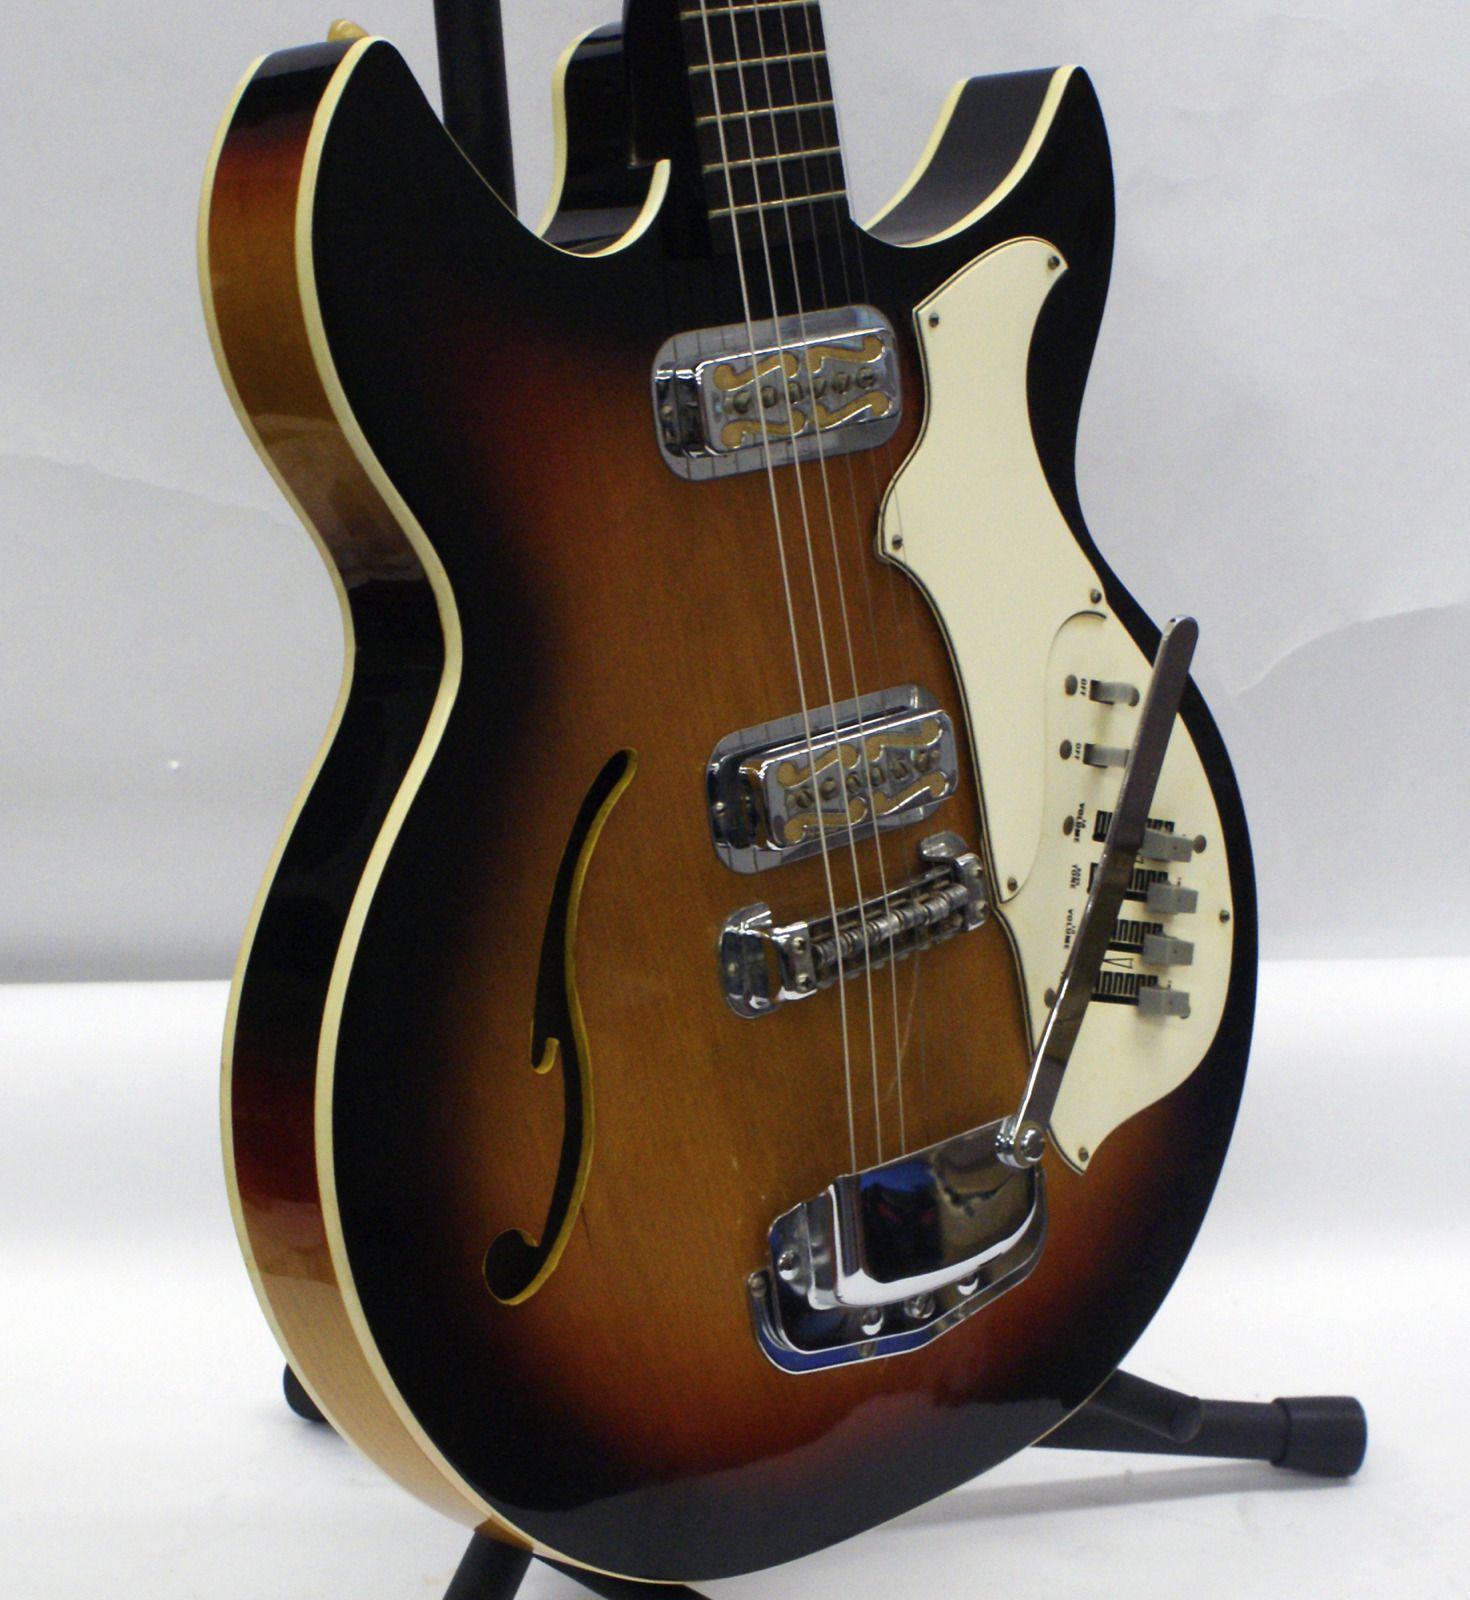 Harmony Les Paul Guitar Wiring Diagram Schemes Diagrams Vintage 68 69 H82 Electric W Dearmond Gold Foil Model History